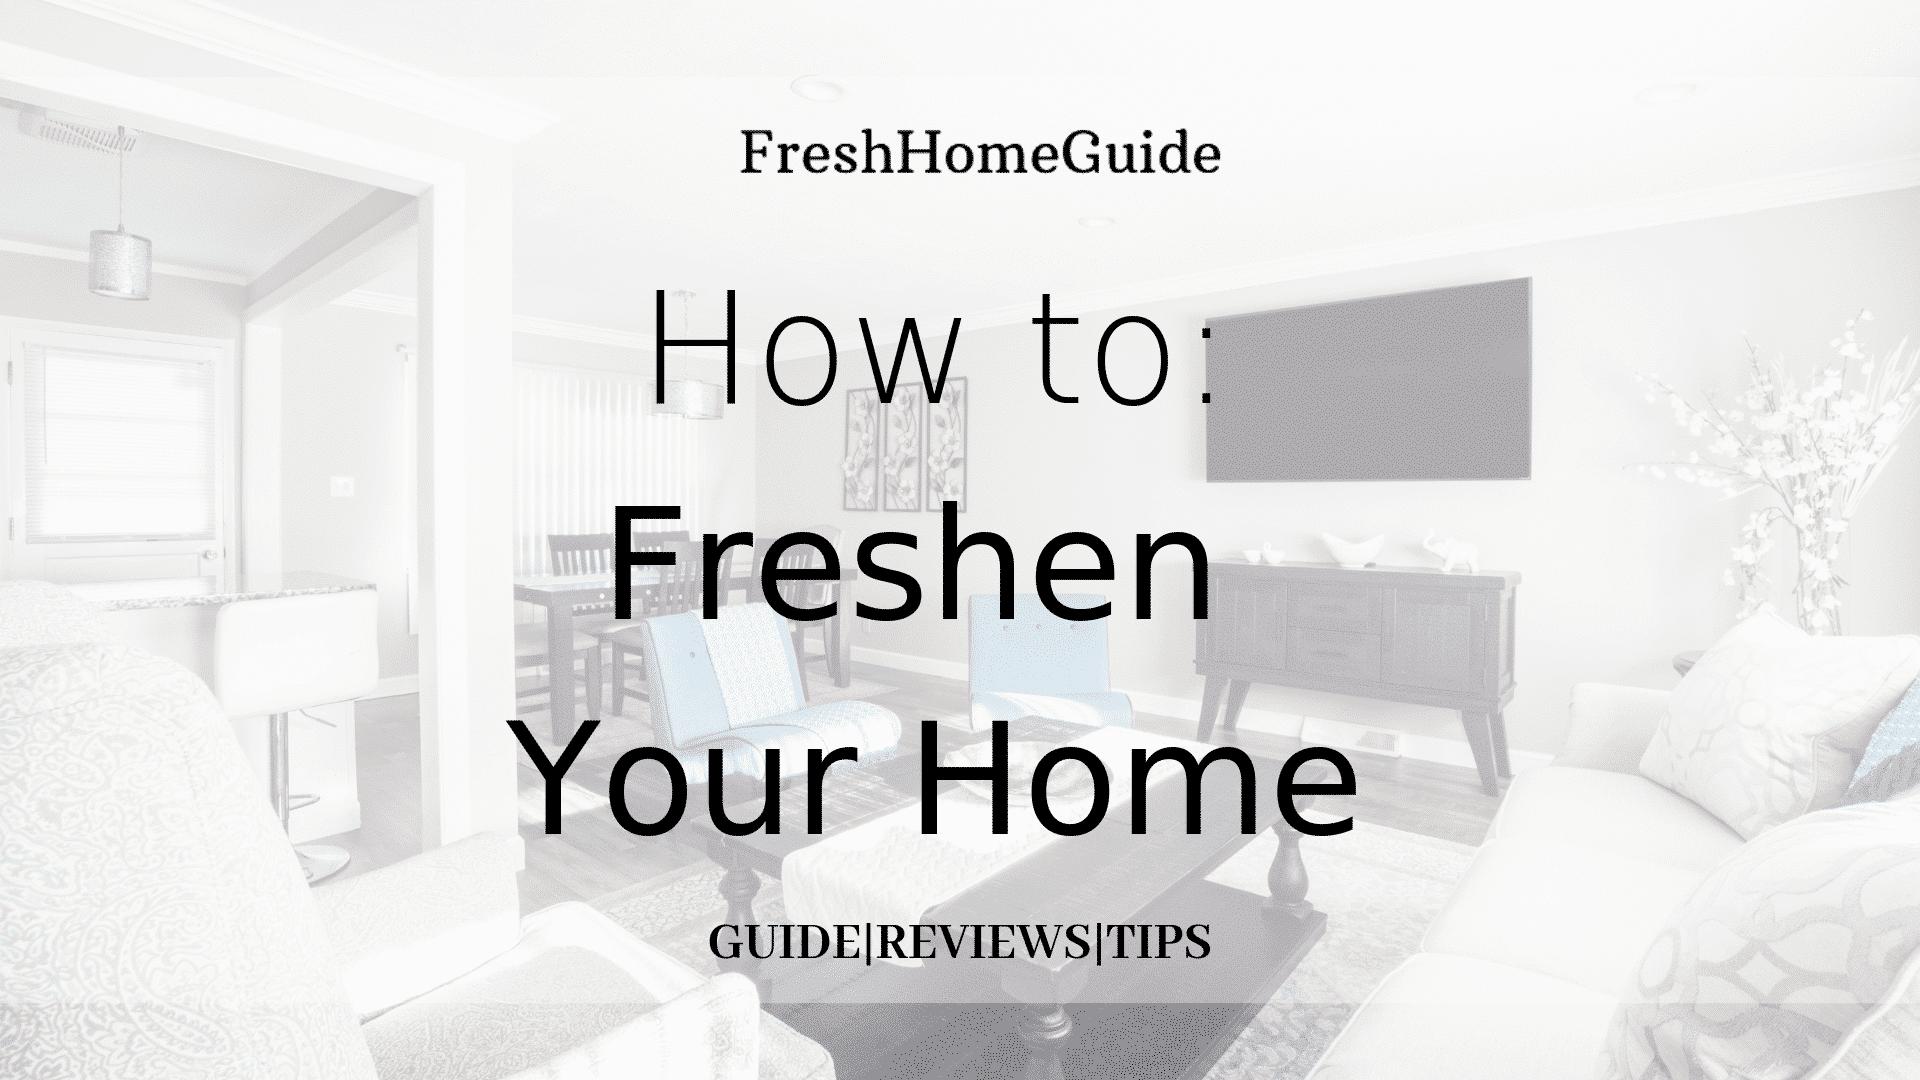 How to keep home fresh